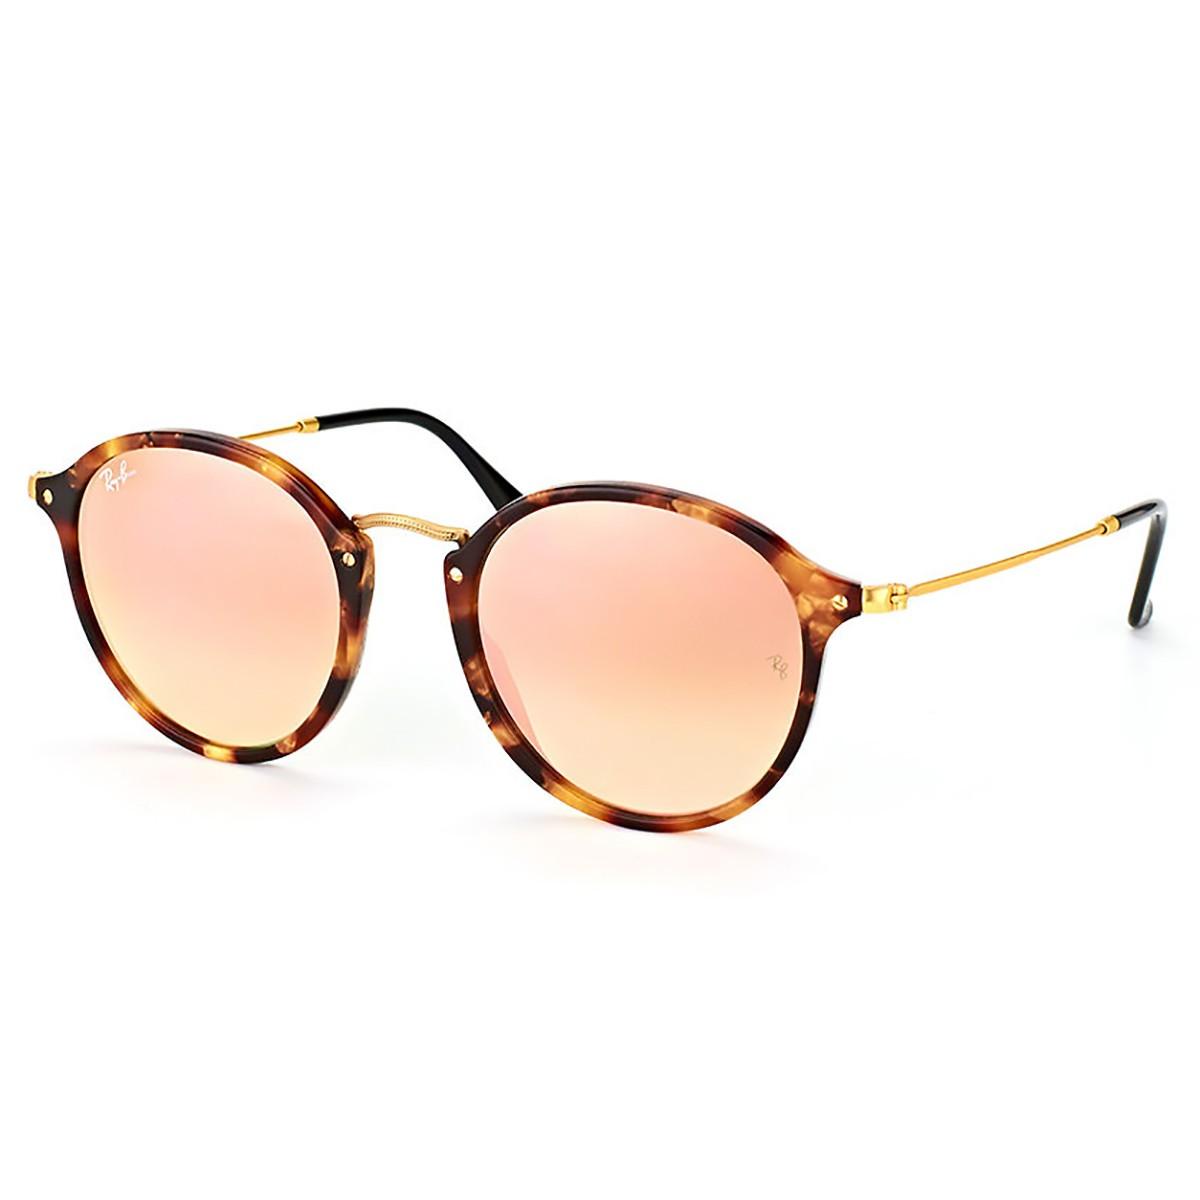 01b1b6a70c Compre Óculos de Sol Ray Ban Round Fleck em 10X | Tri-Jóia Shop